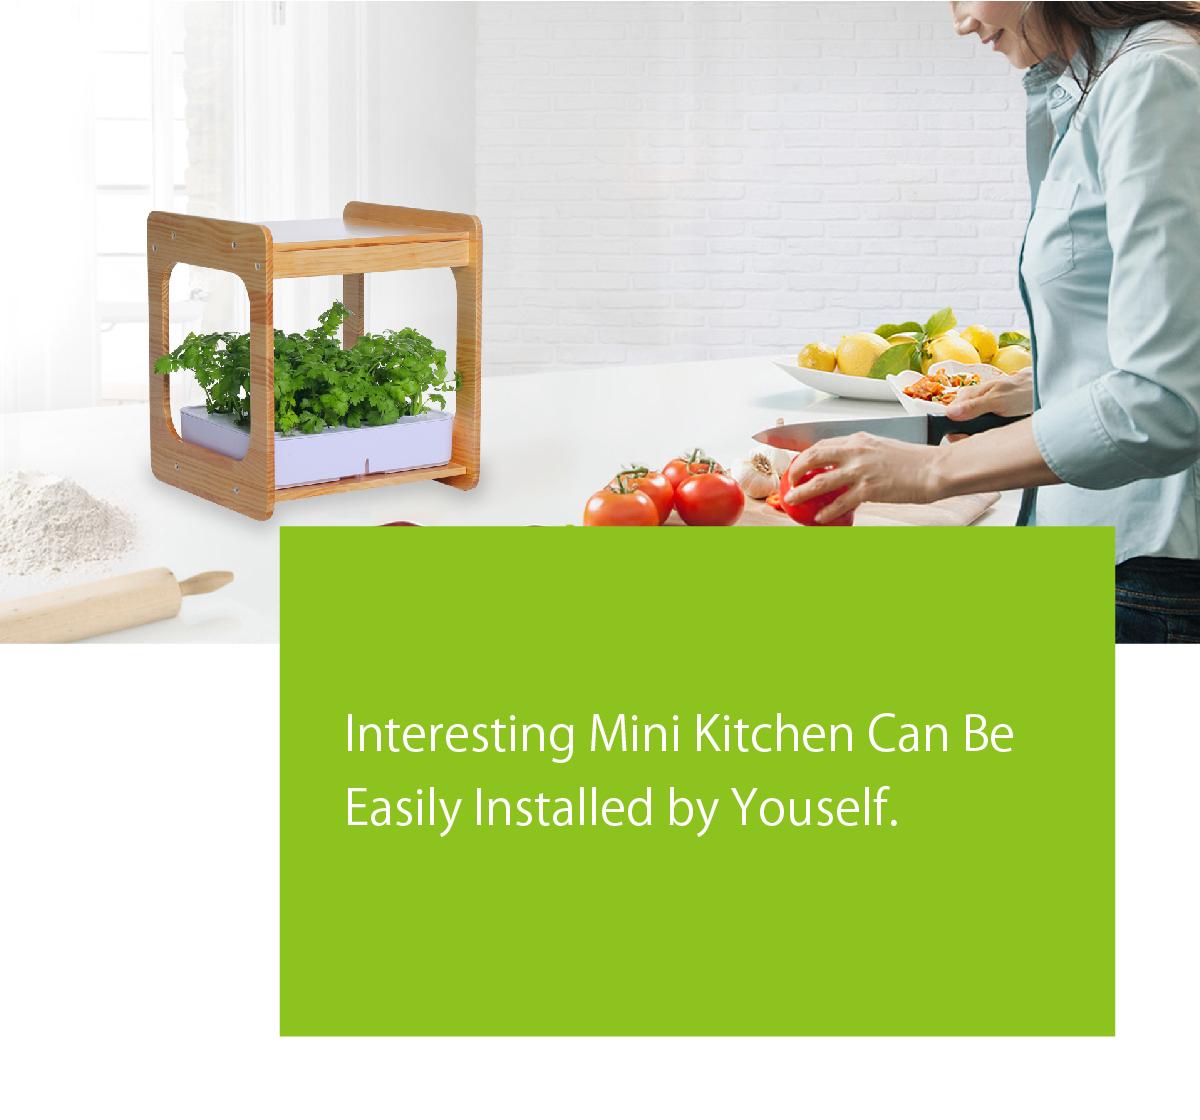 indoor gardening, kitchen gardening, growyourownfood, herbs, basil, lettuce